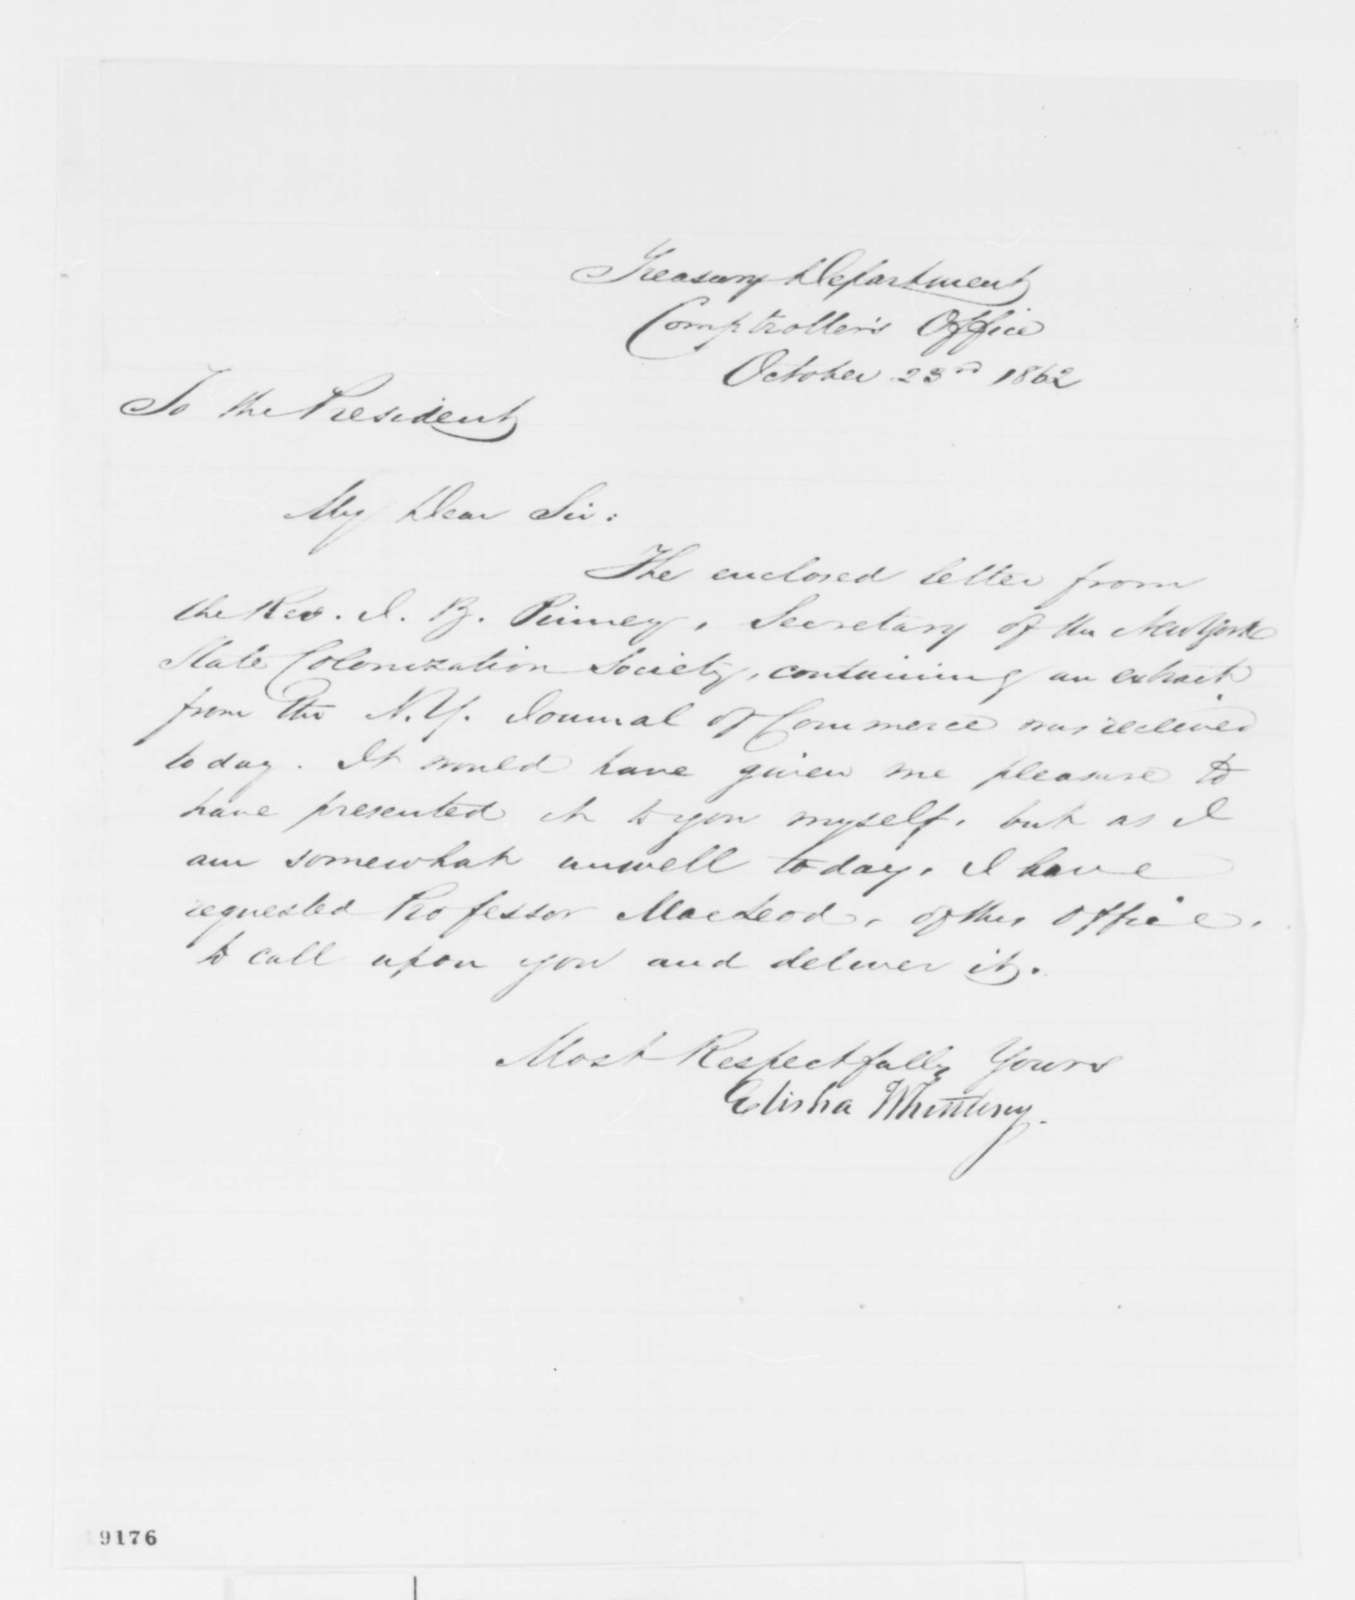 Elisha Whittlesey to Abraham Lincoln, Thursday, October 23, 1862  (Cover letter)